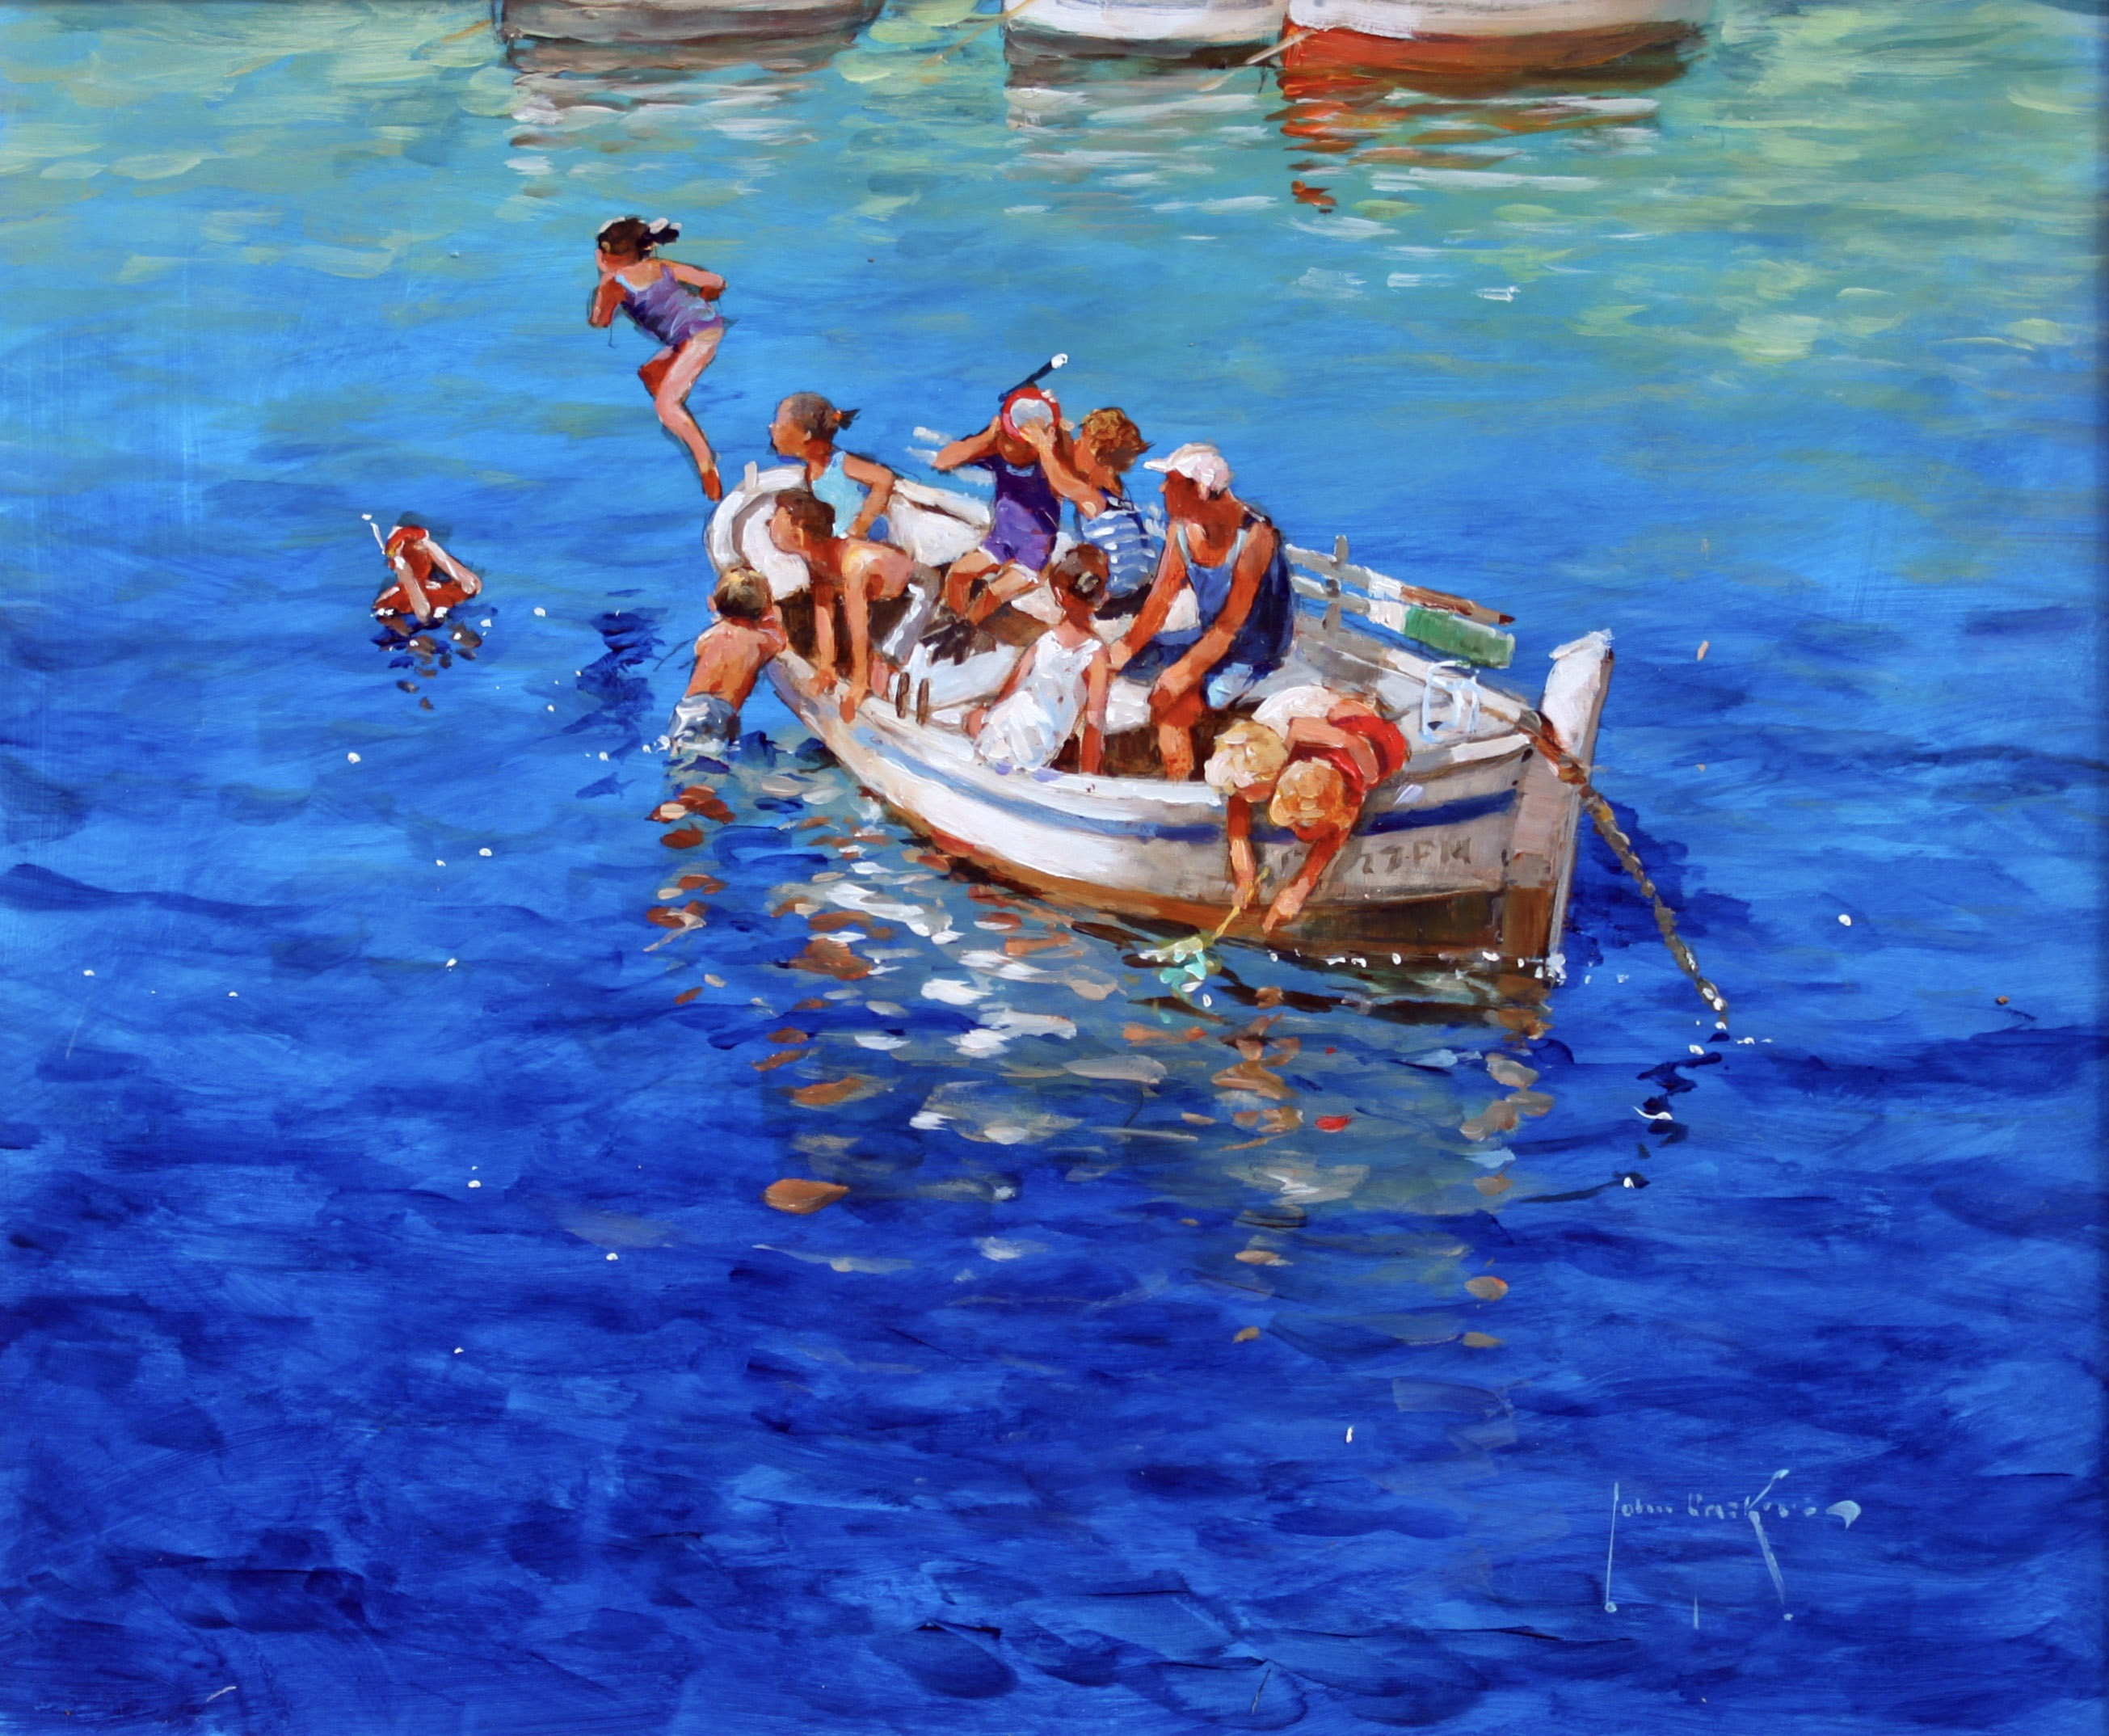 Swimming off the Litt... by  John Haskins - Masterpiece Online